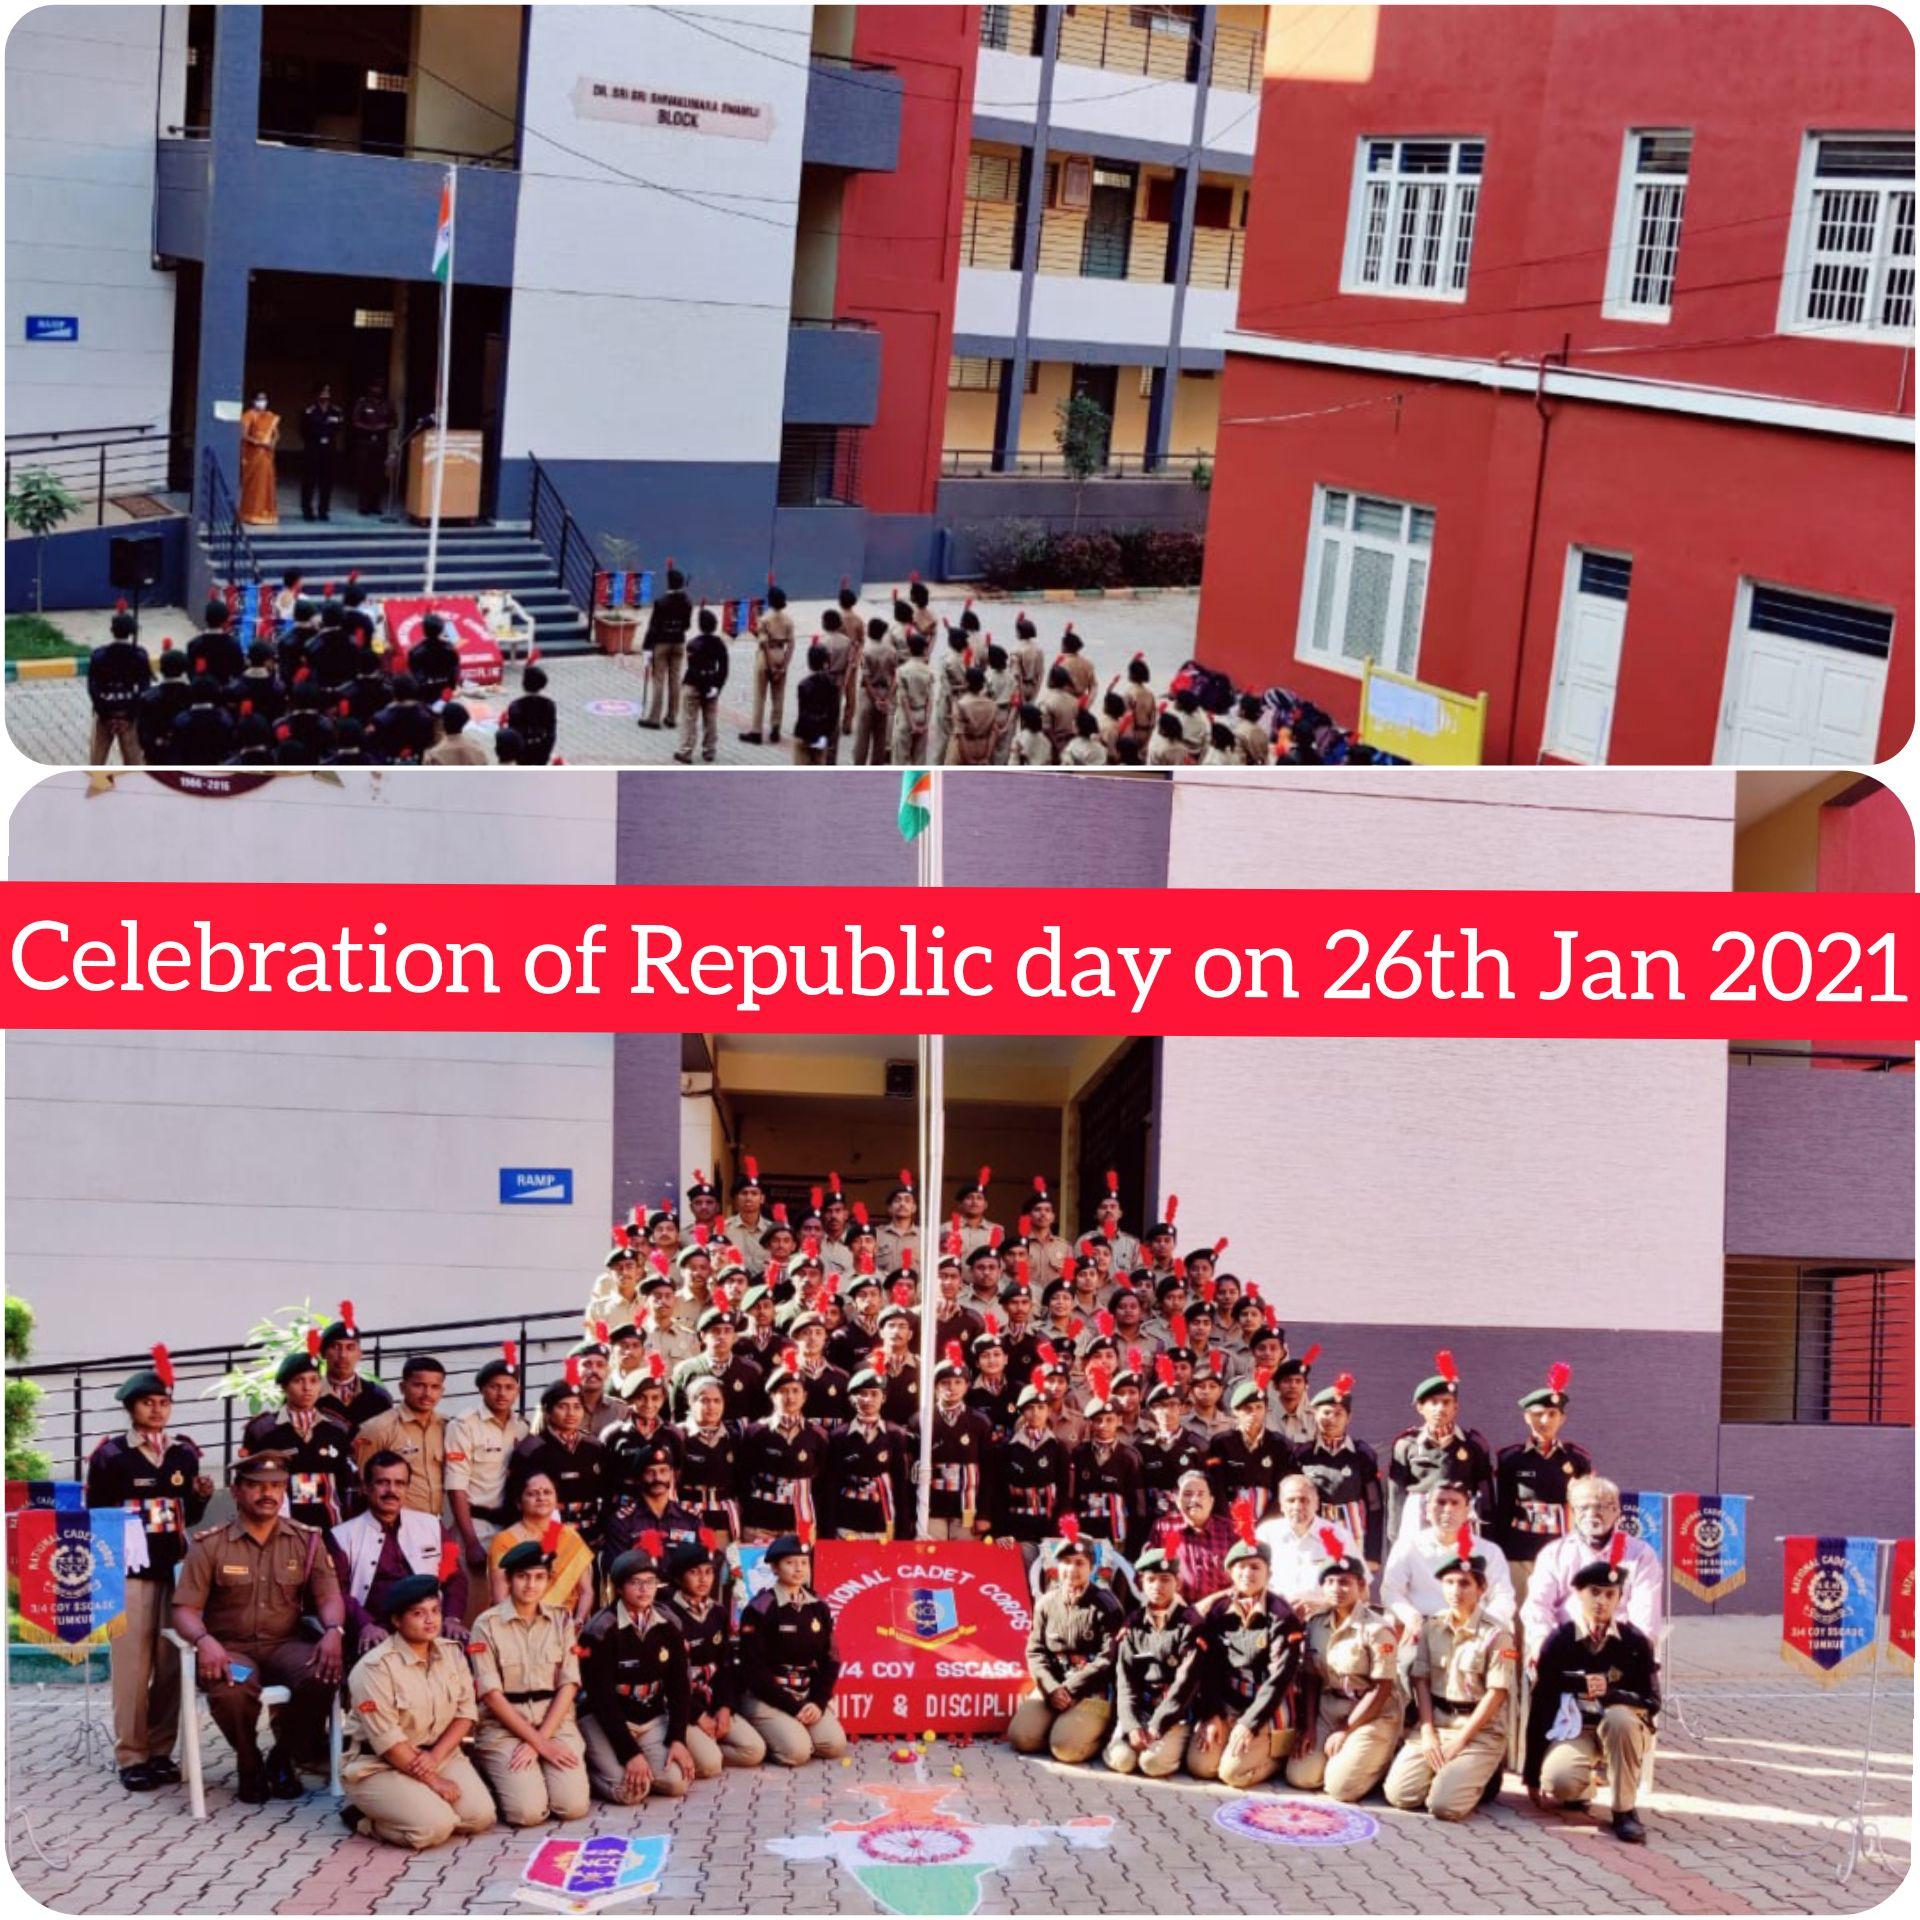 Republic Day Celebration on 26th Jan 2021